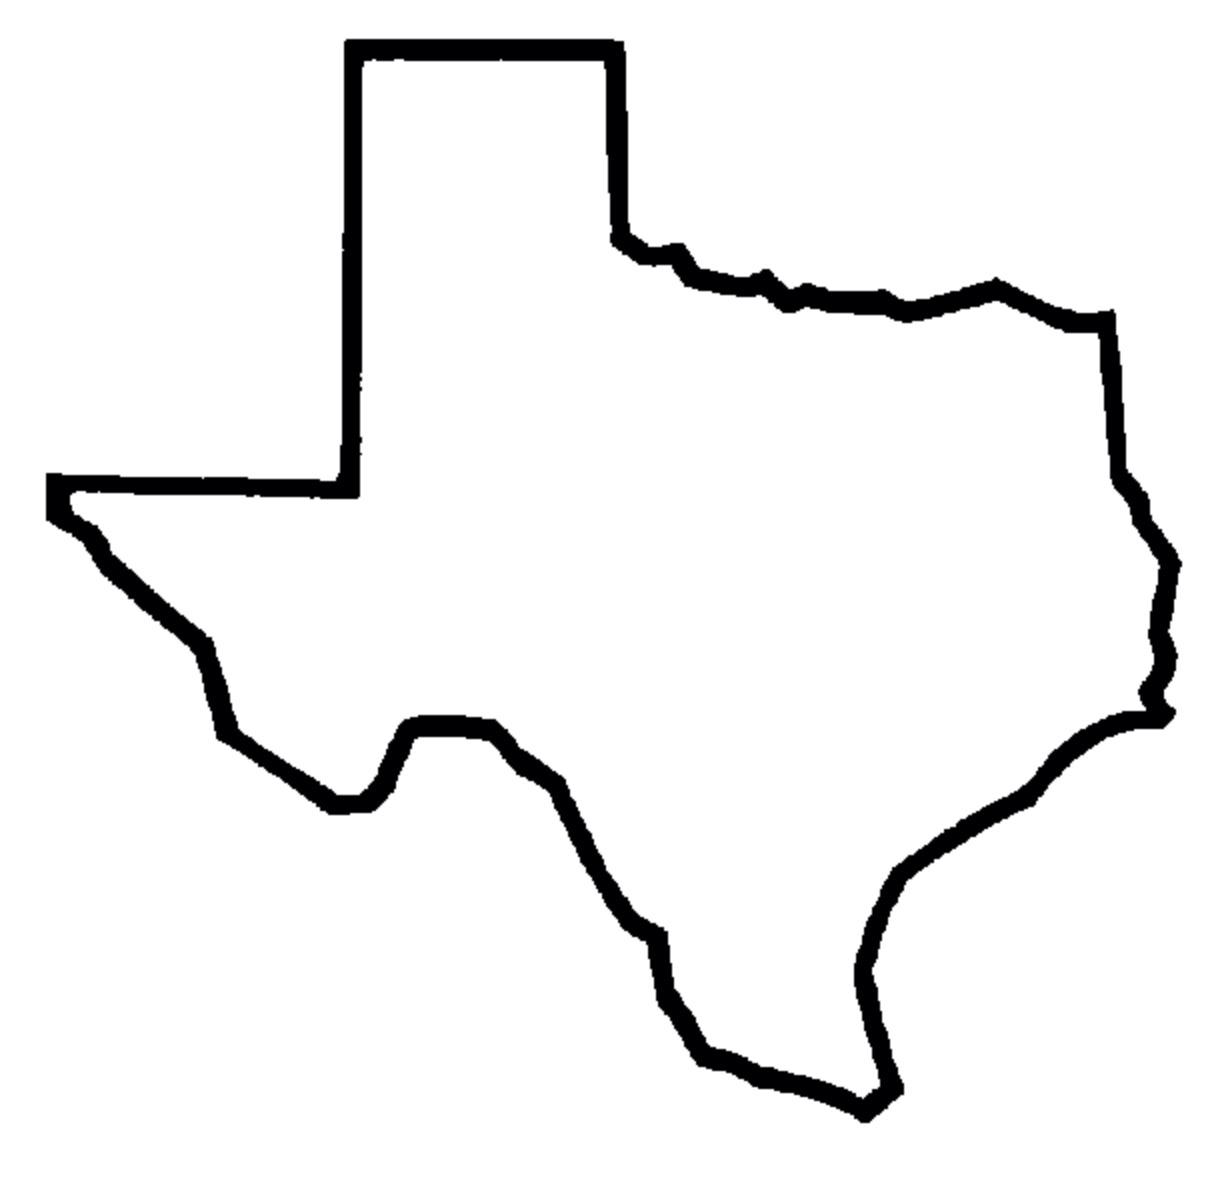 1210x1196 Pin By Jason Rendall On Home Texas, Cricut